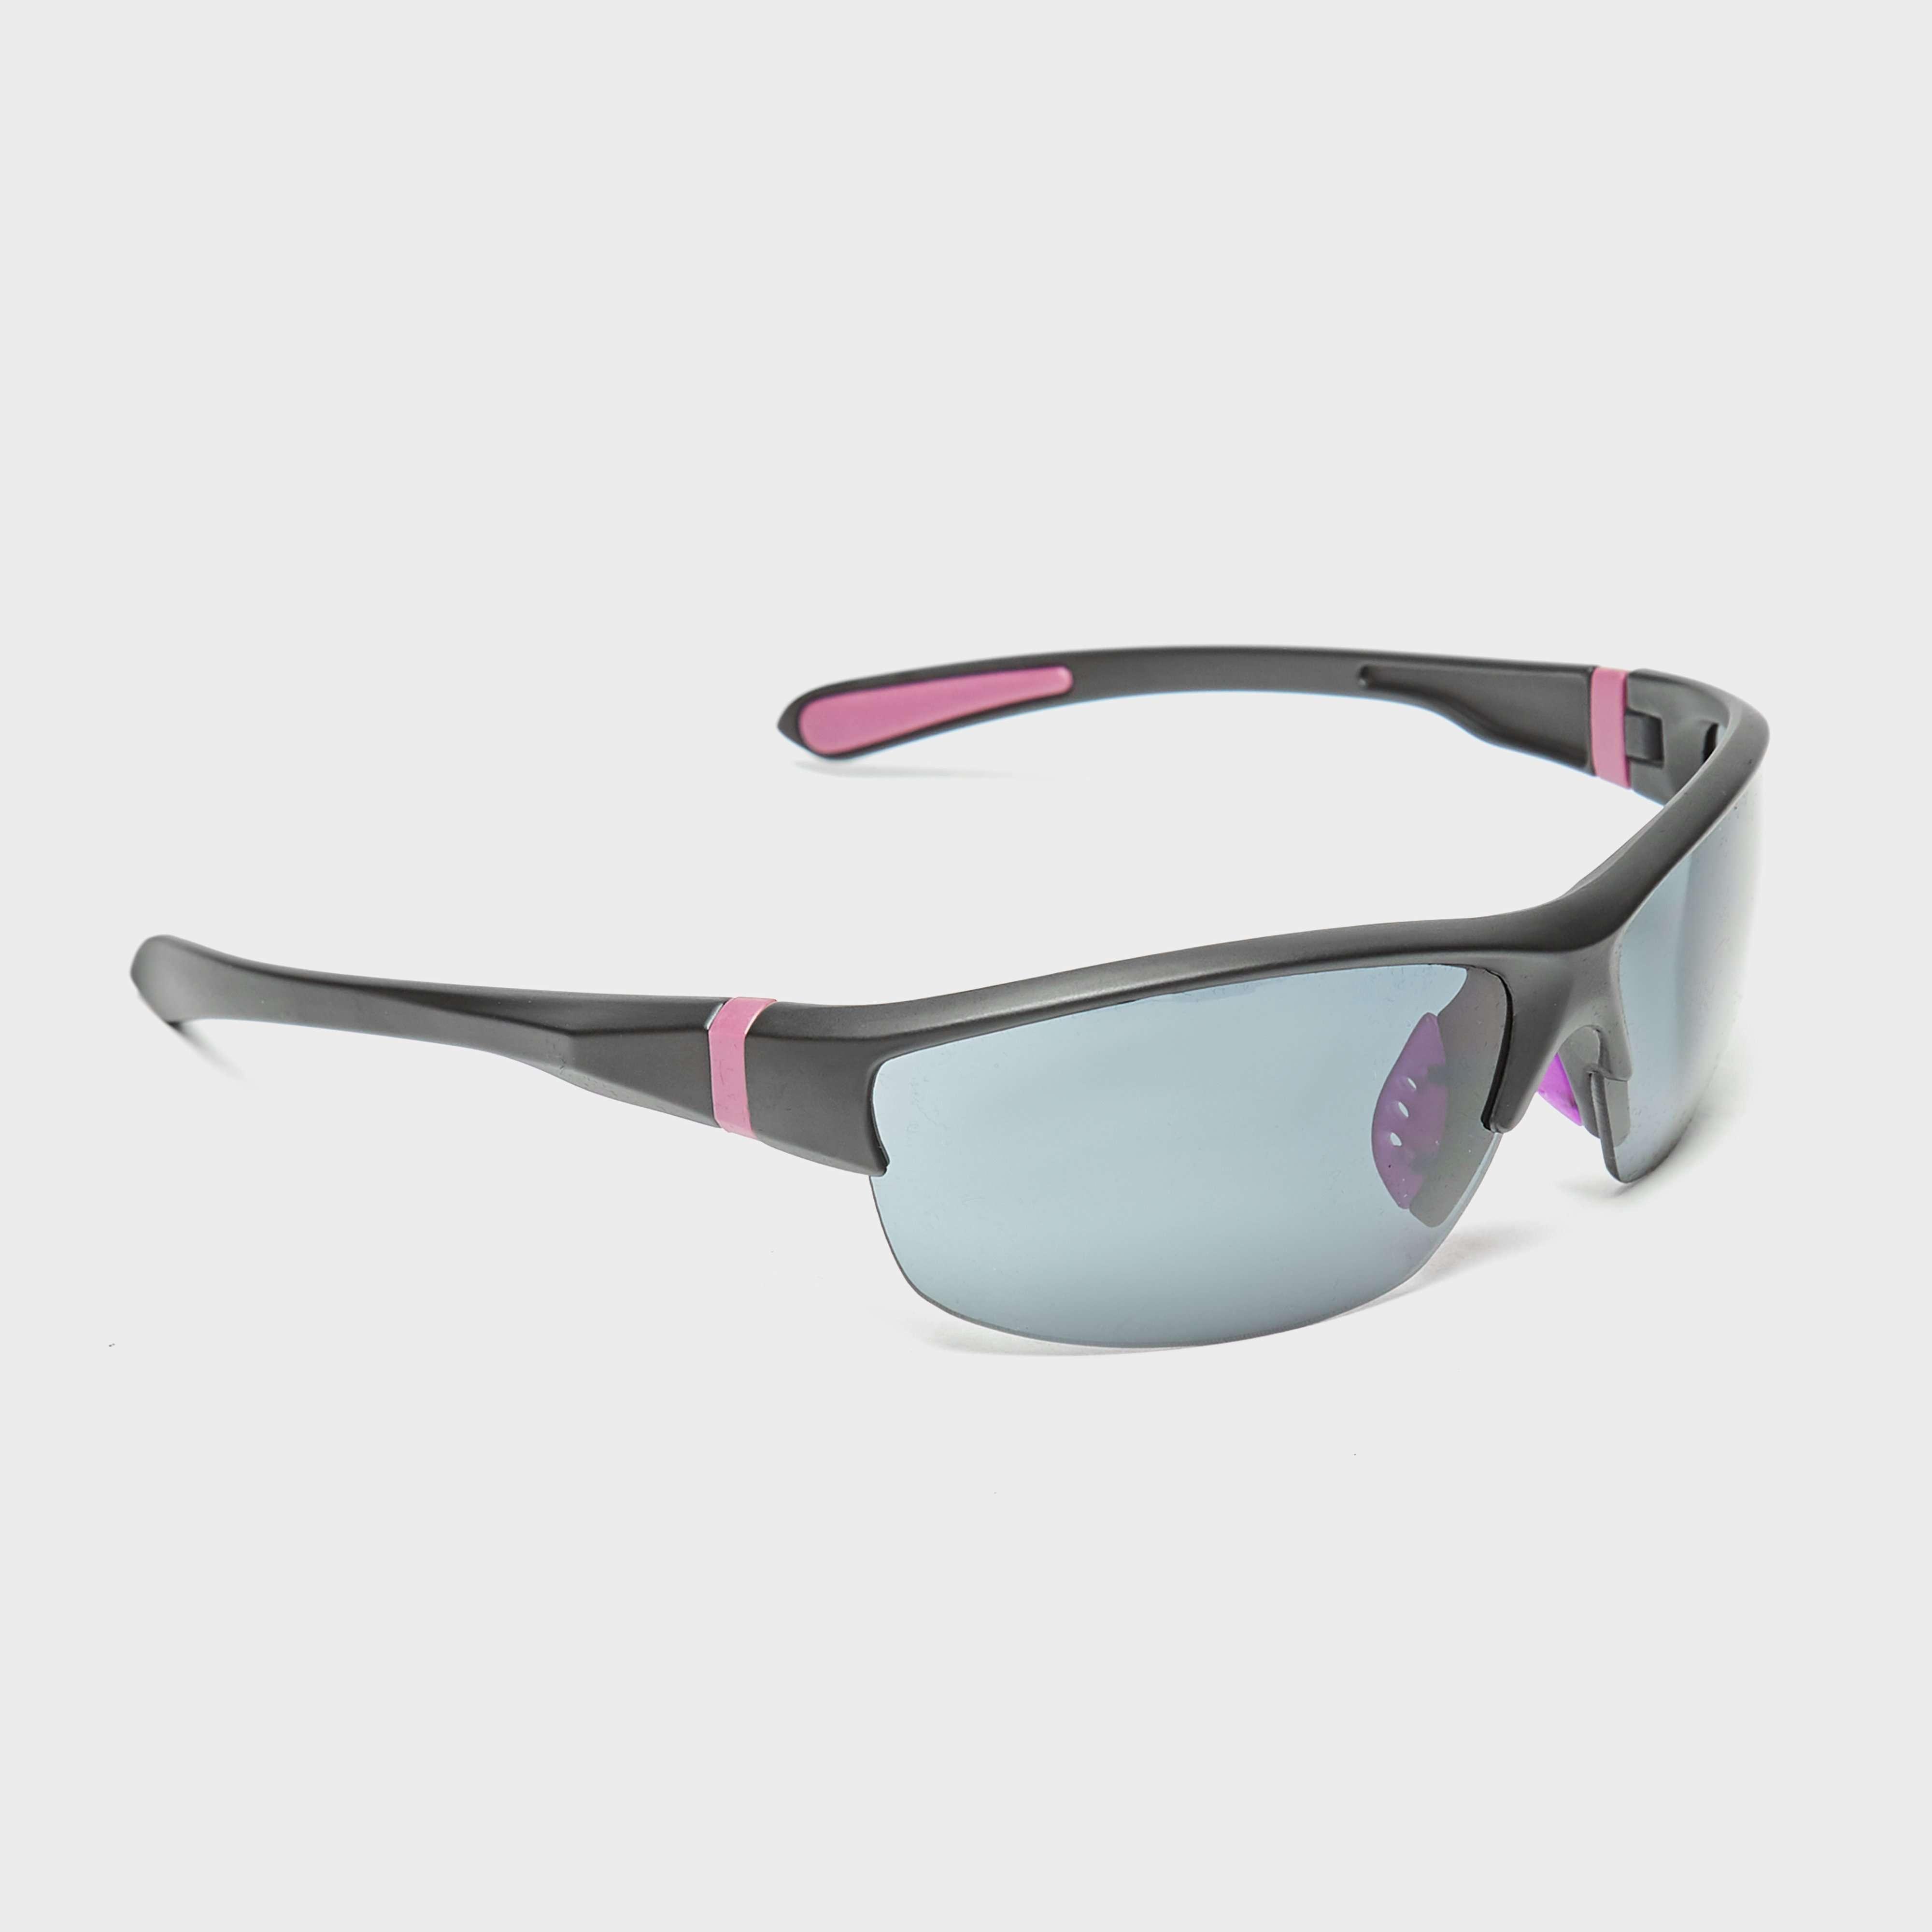 PETER STORM Women's Half Frame Sport Wrap Sunglasses